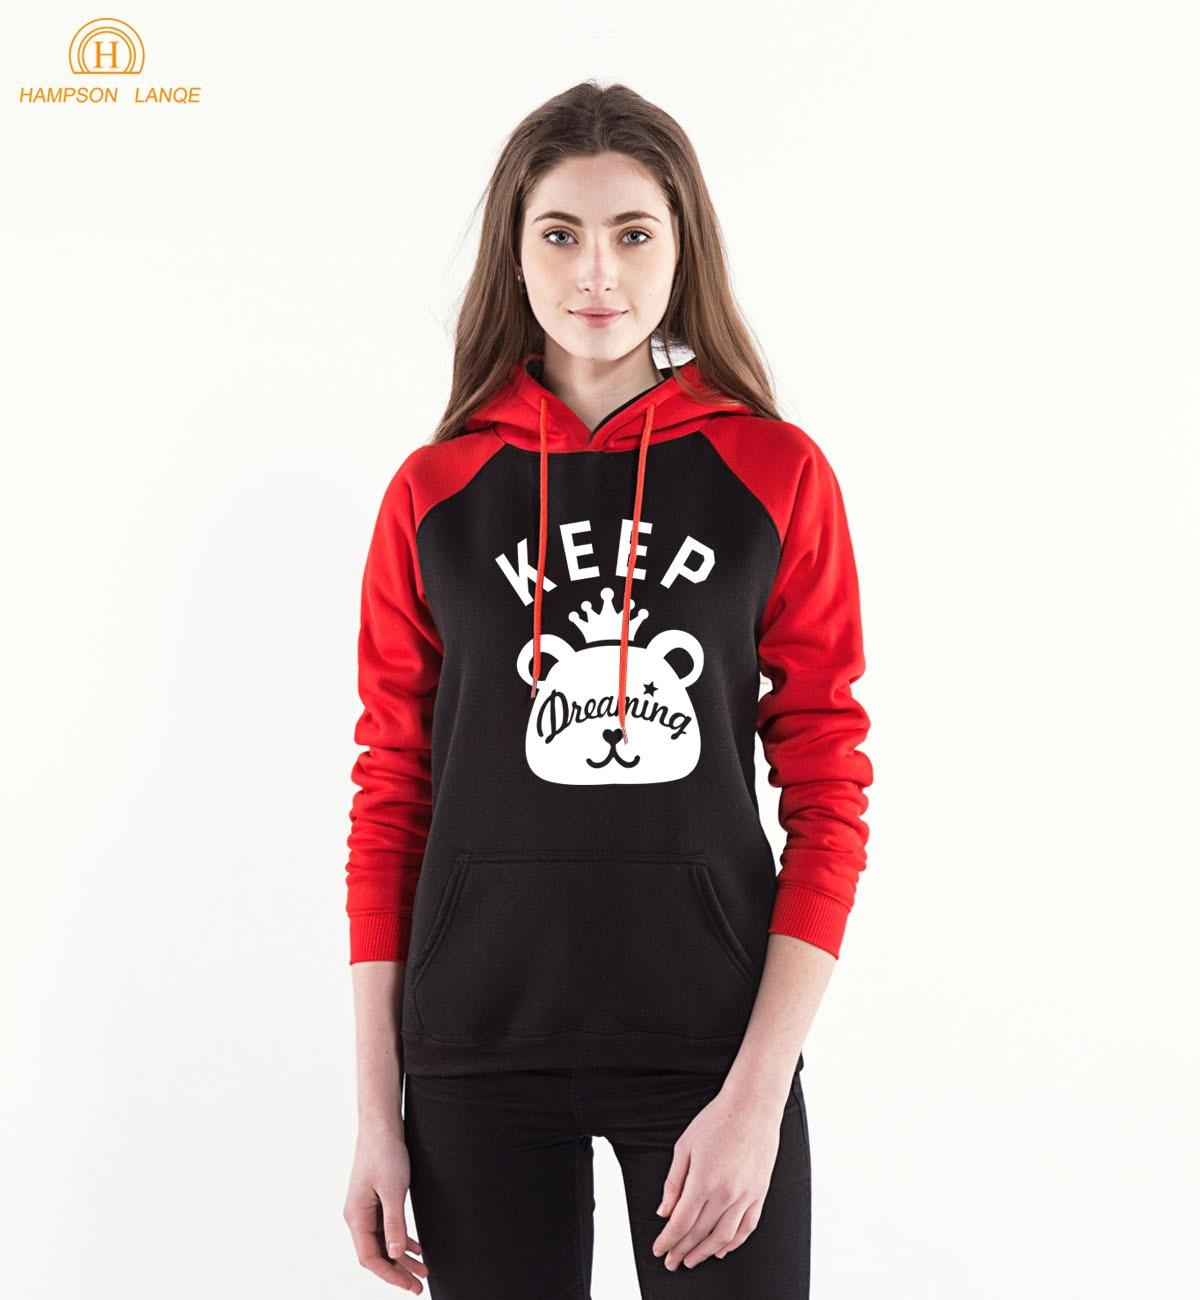 Keep Dreaming Kawaii Bear Print Raglan Hoodies For Girls 2019 Spring Autumn Casual Red Sweatshirts Women's K-pop Harajuku Hoody